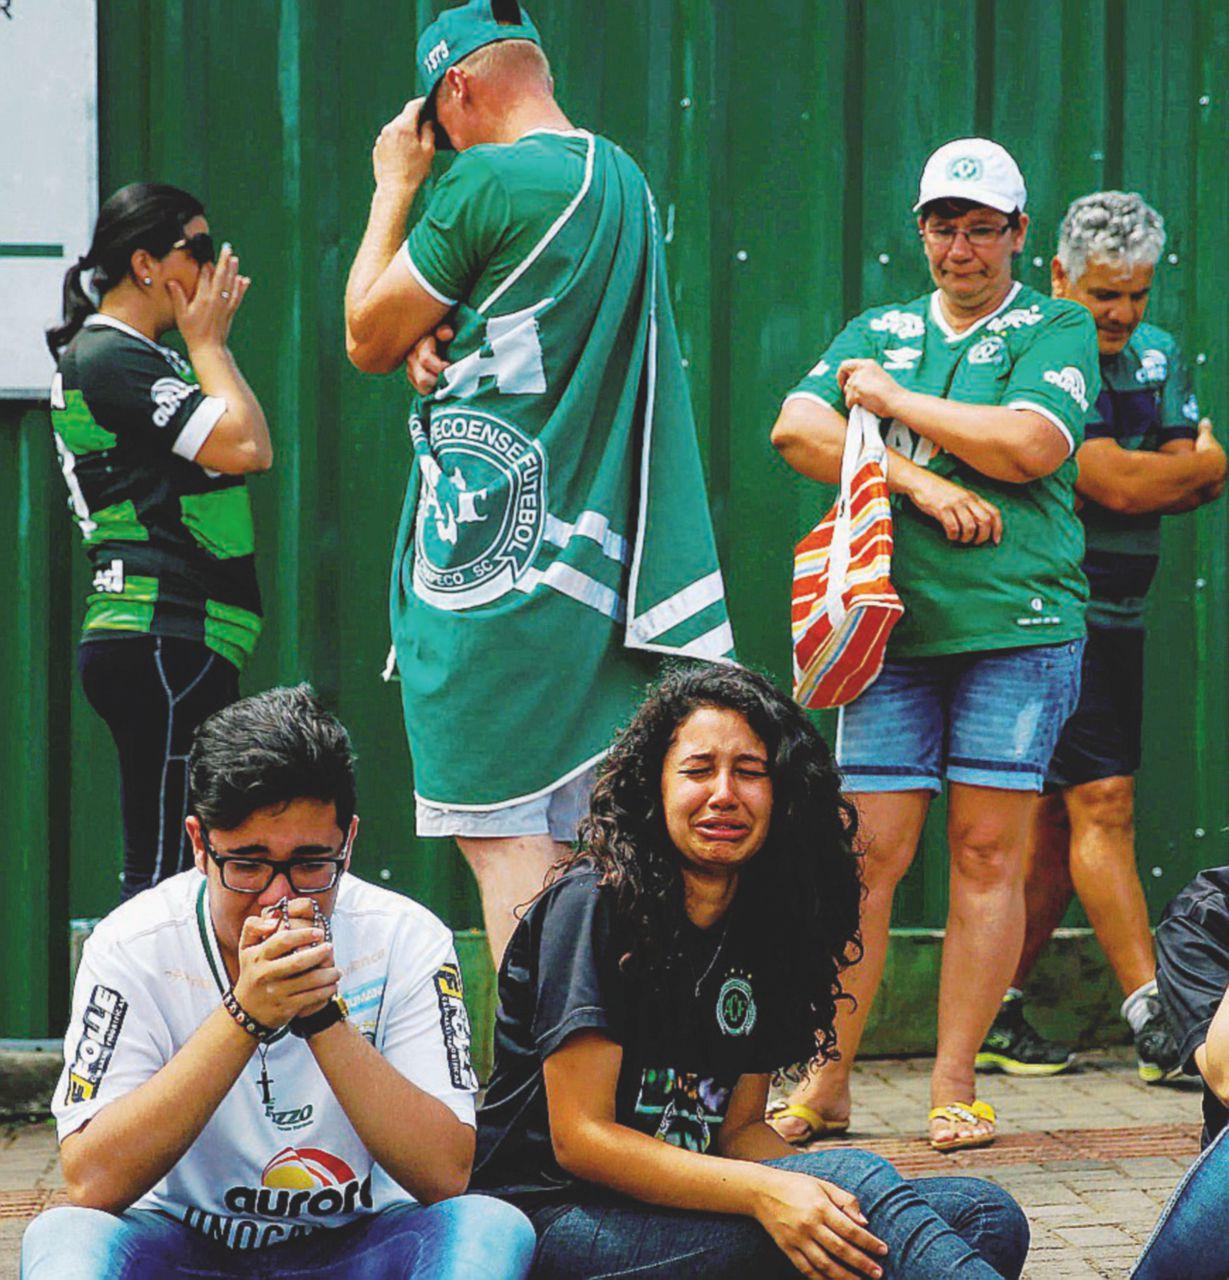 Una Superga brasiliana: Chapecoense azzerato